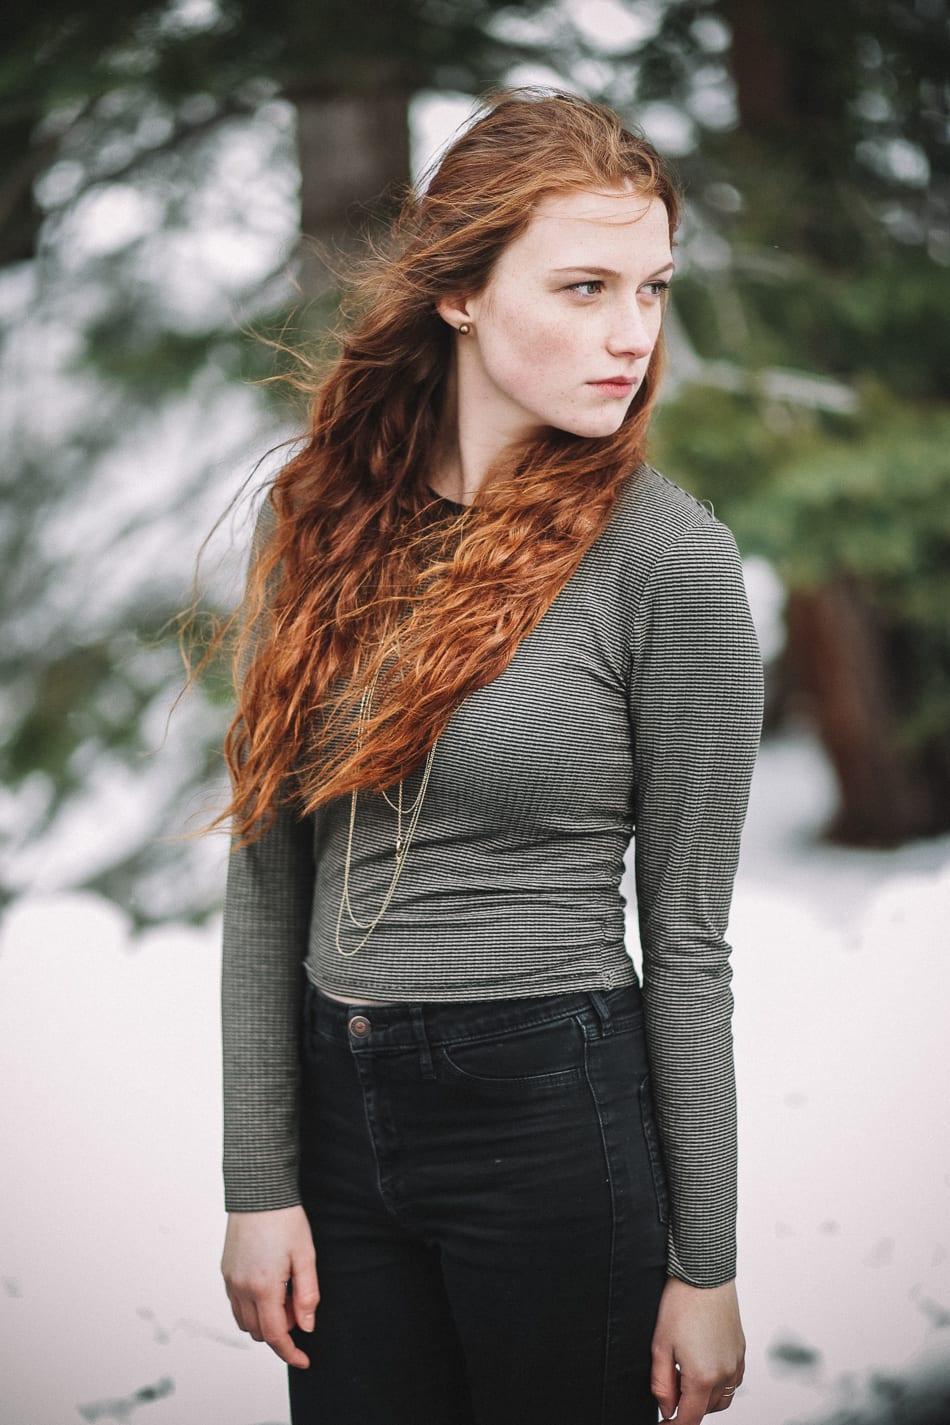 mount-lassen-winter-portrait-photo-12